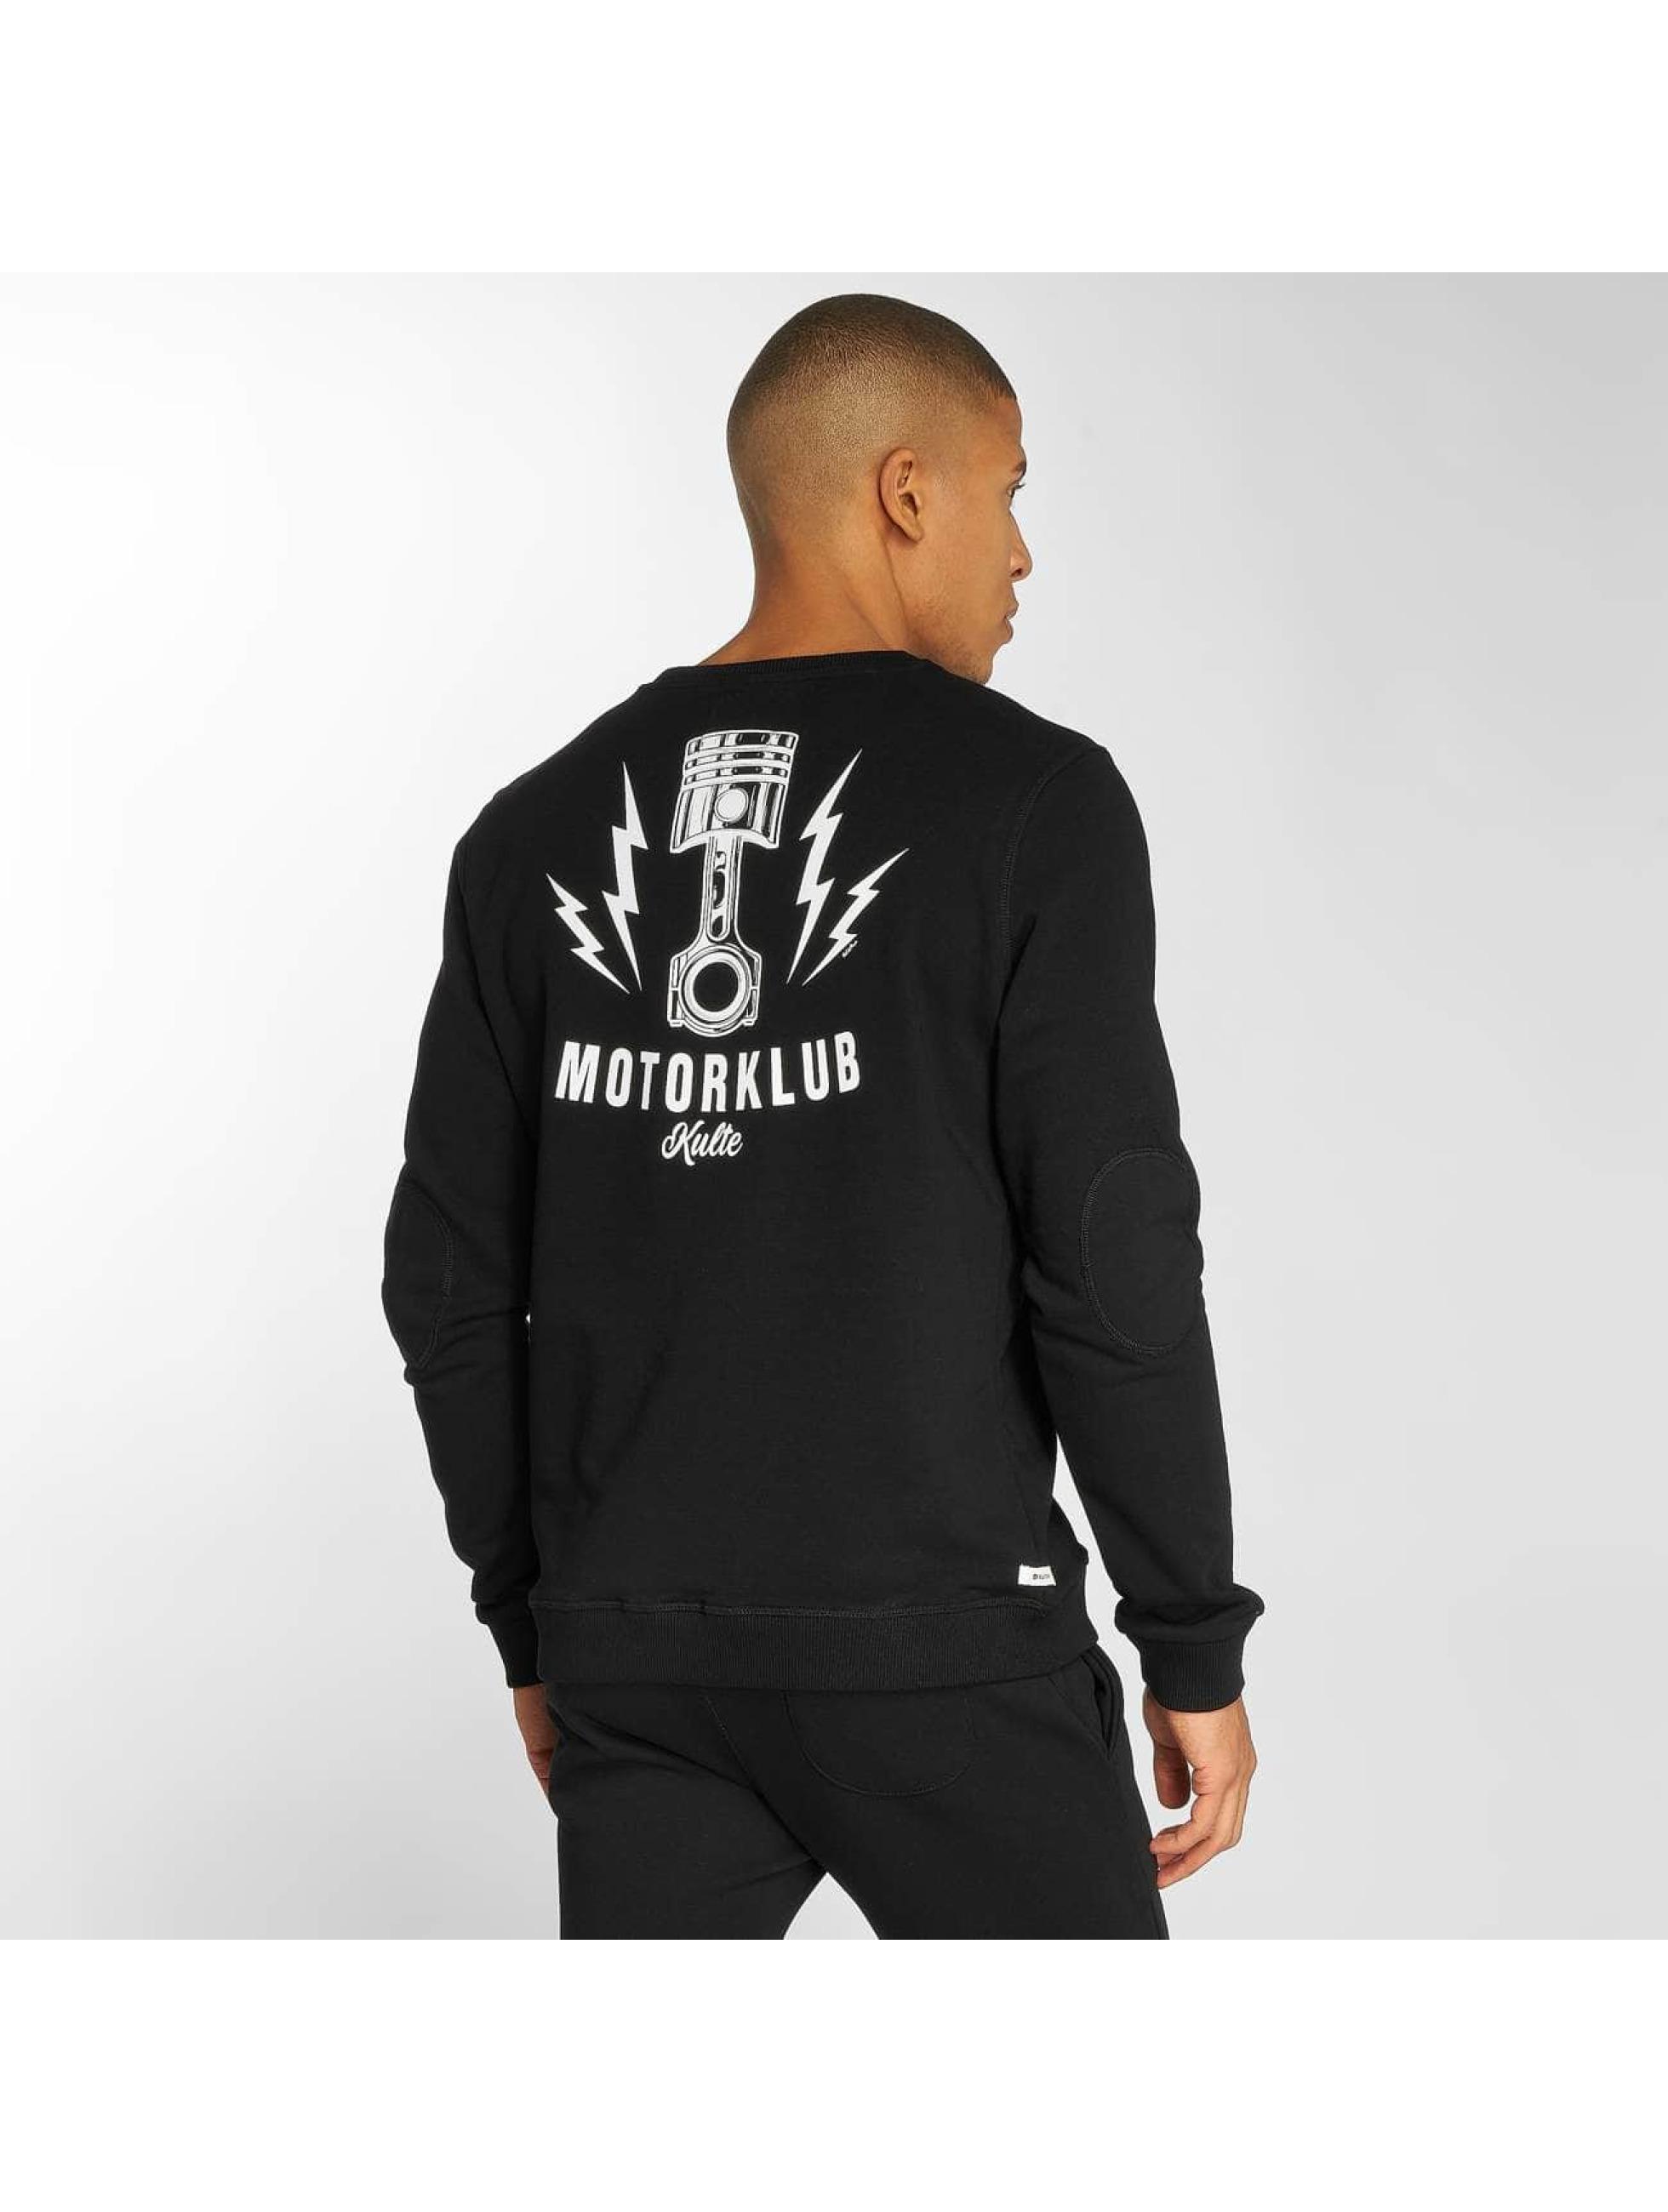 Kulte Pullover Motorklub schwarz